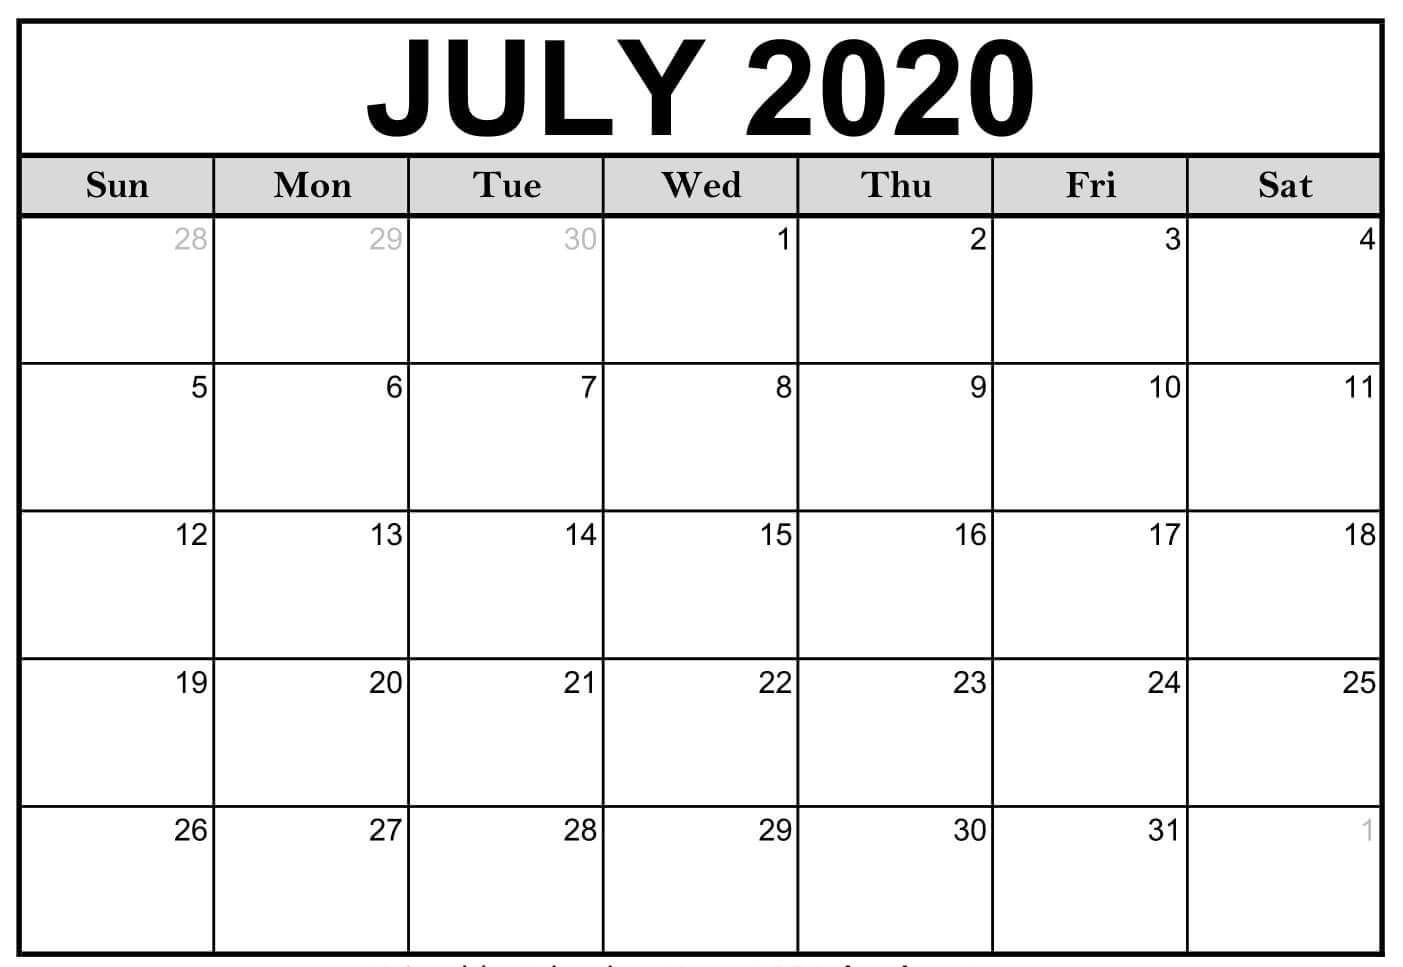 July Calendar 2020 Printable